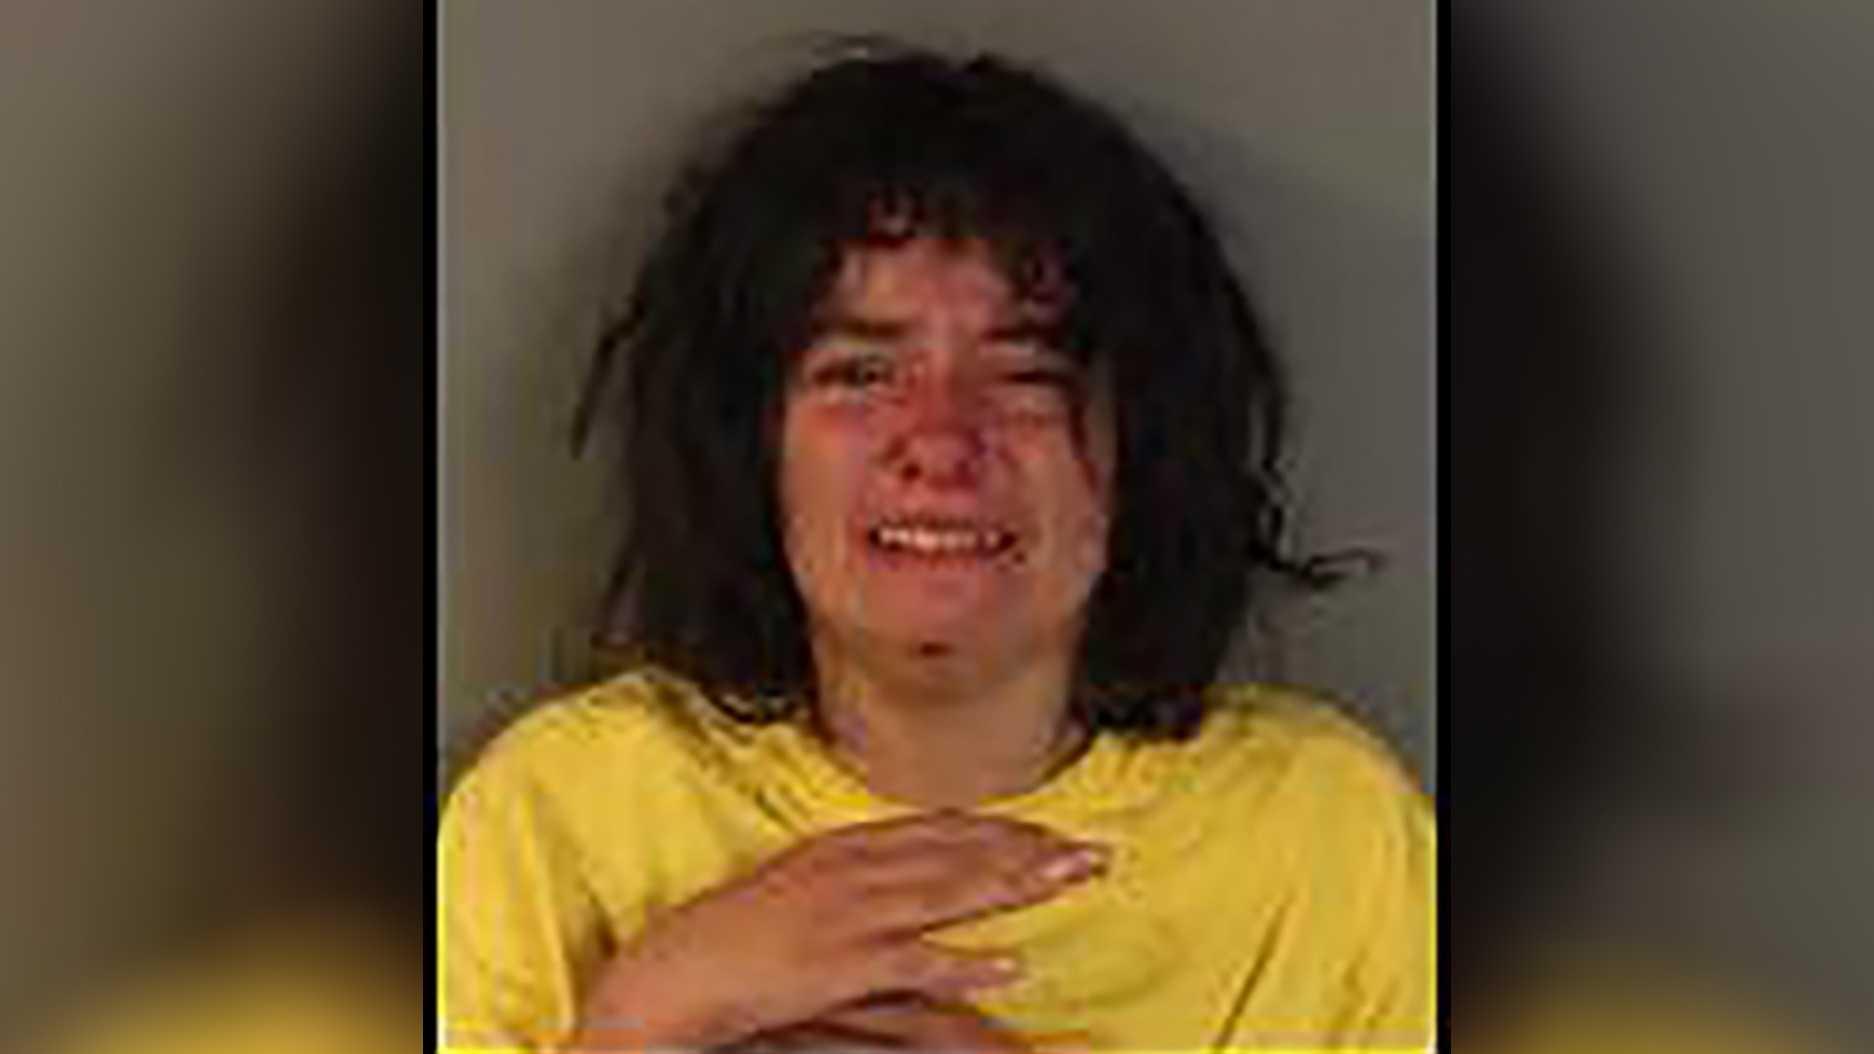 Vanessa Mielke, 32, of Auburn